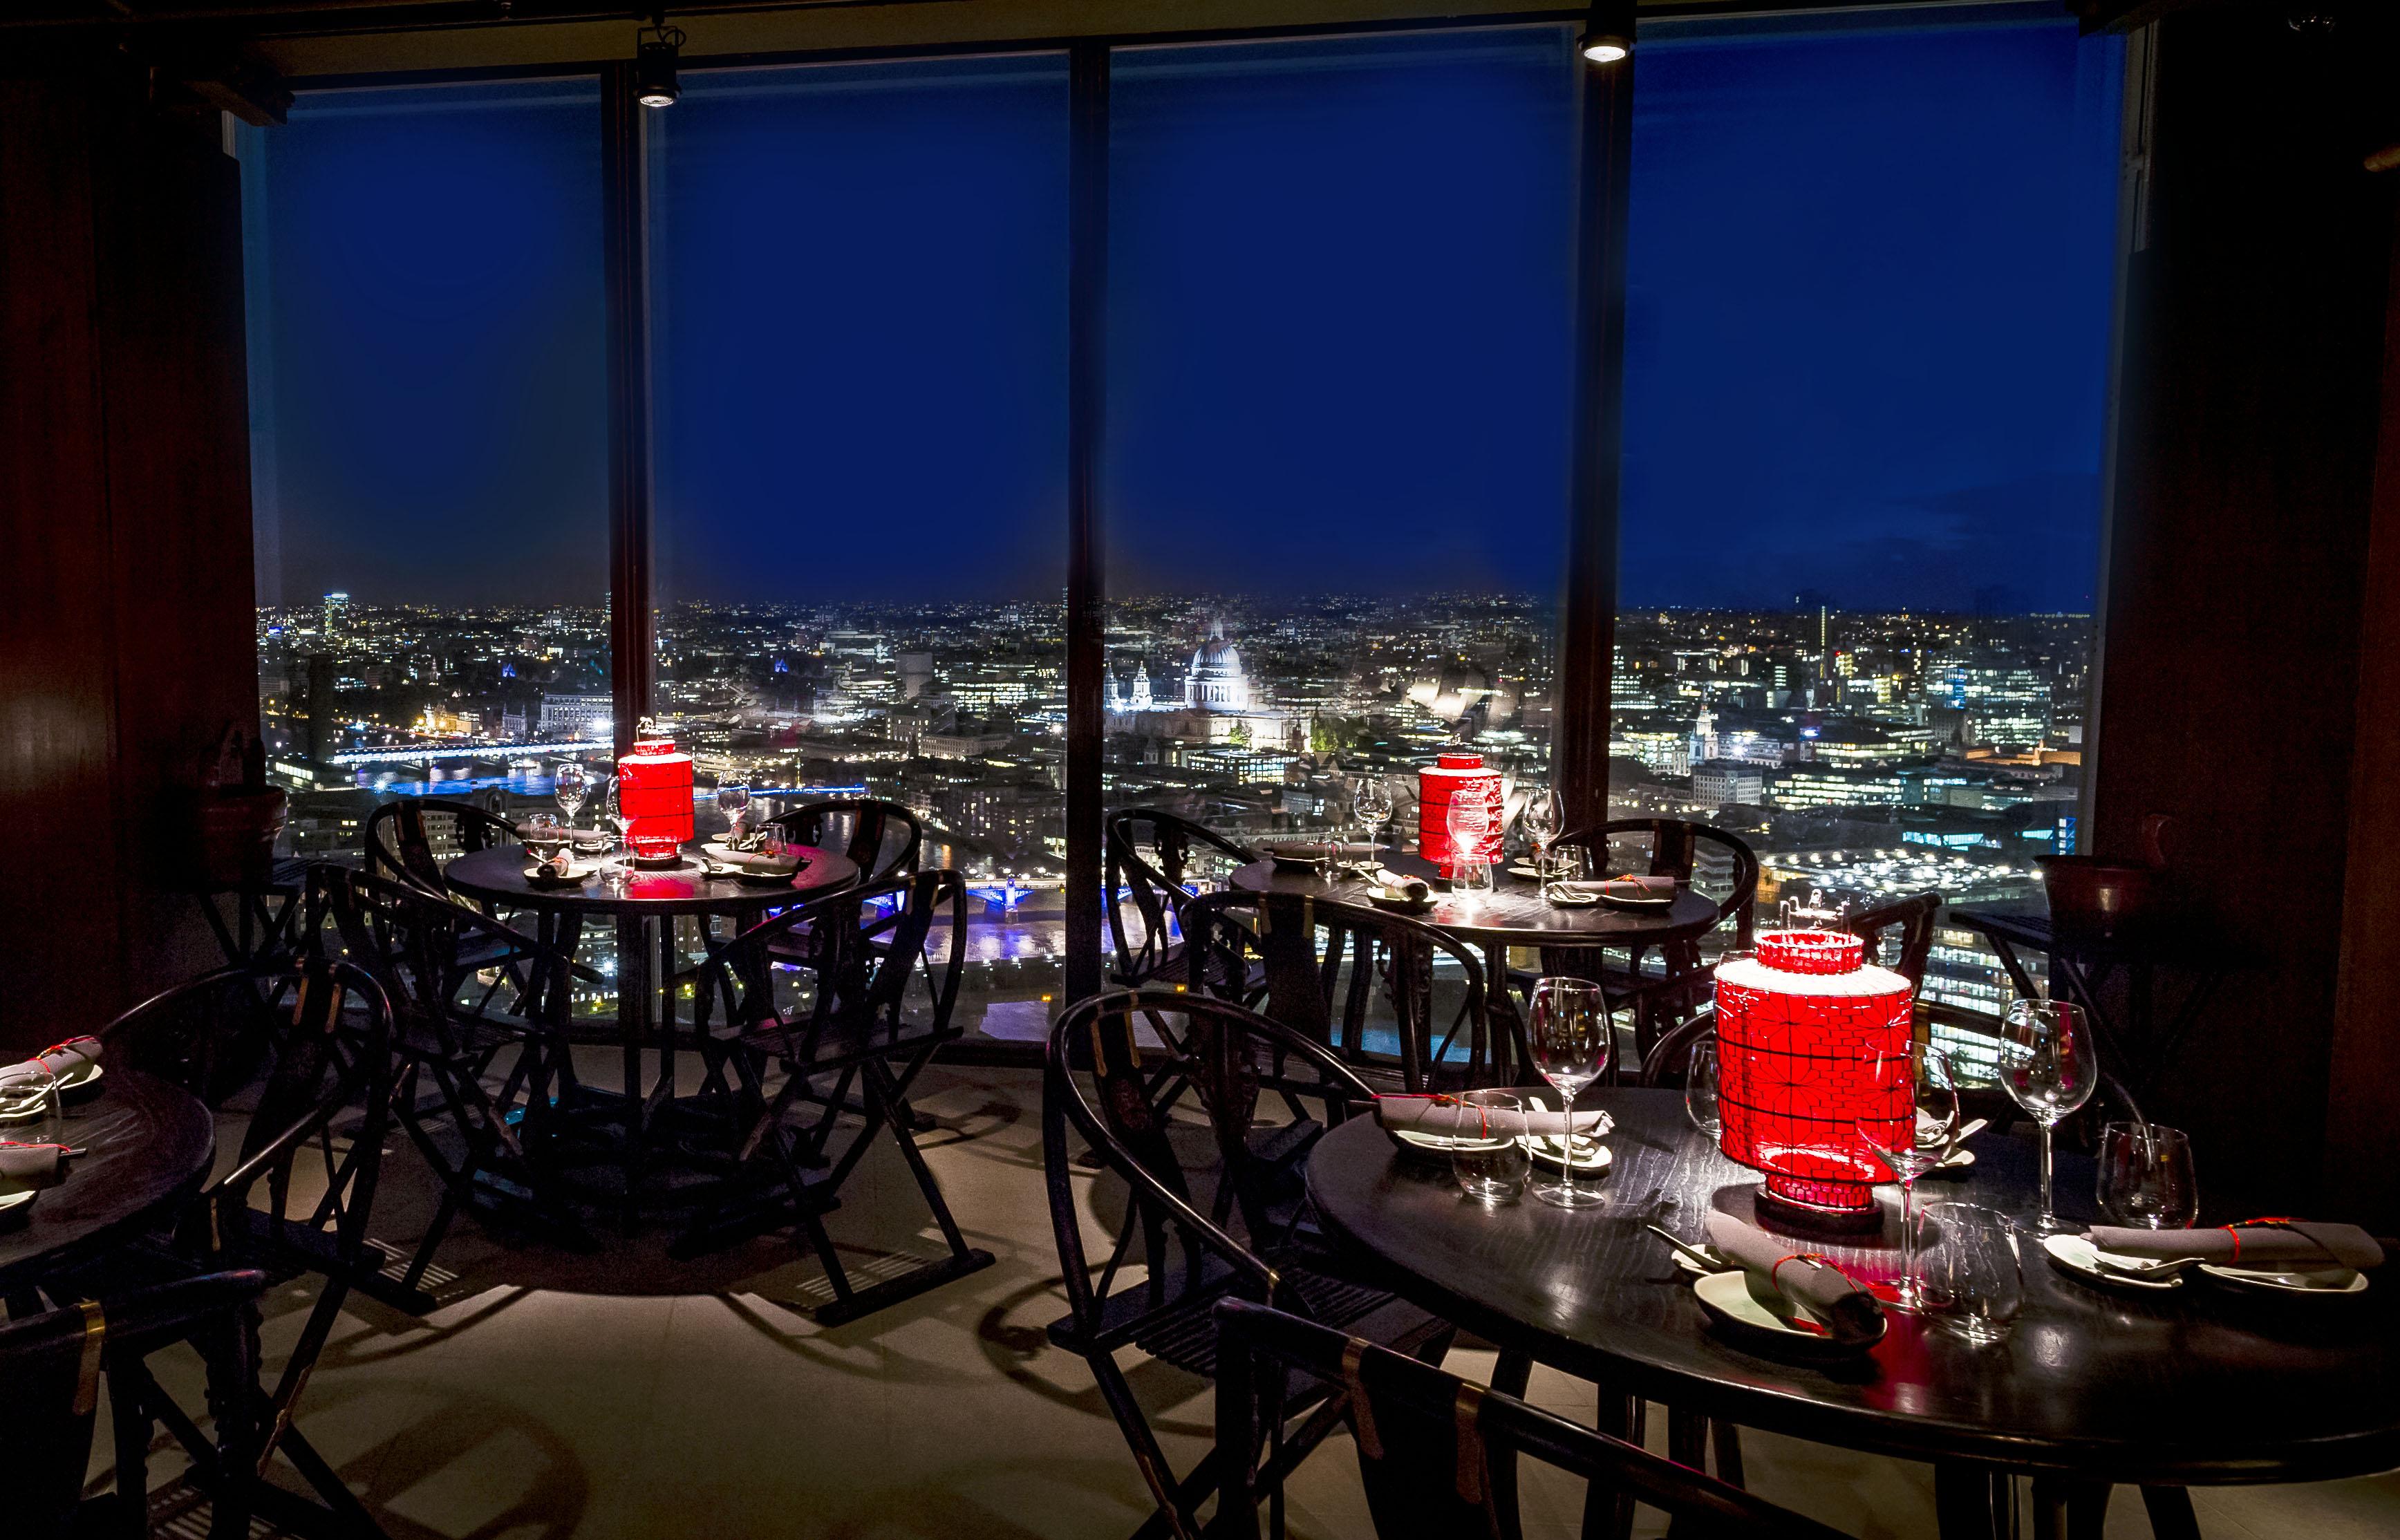 Quiet Bars Restaurant In Central London